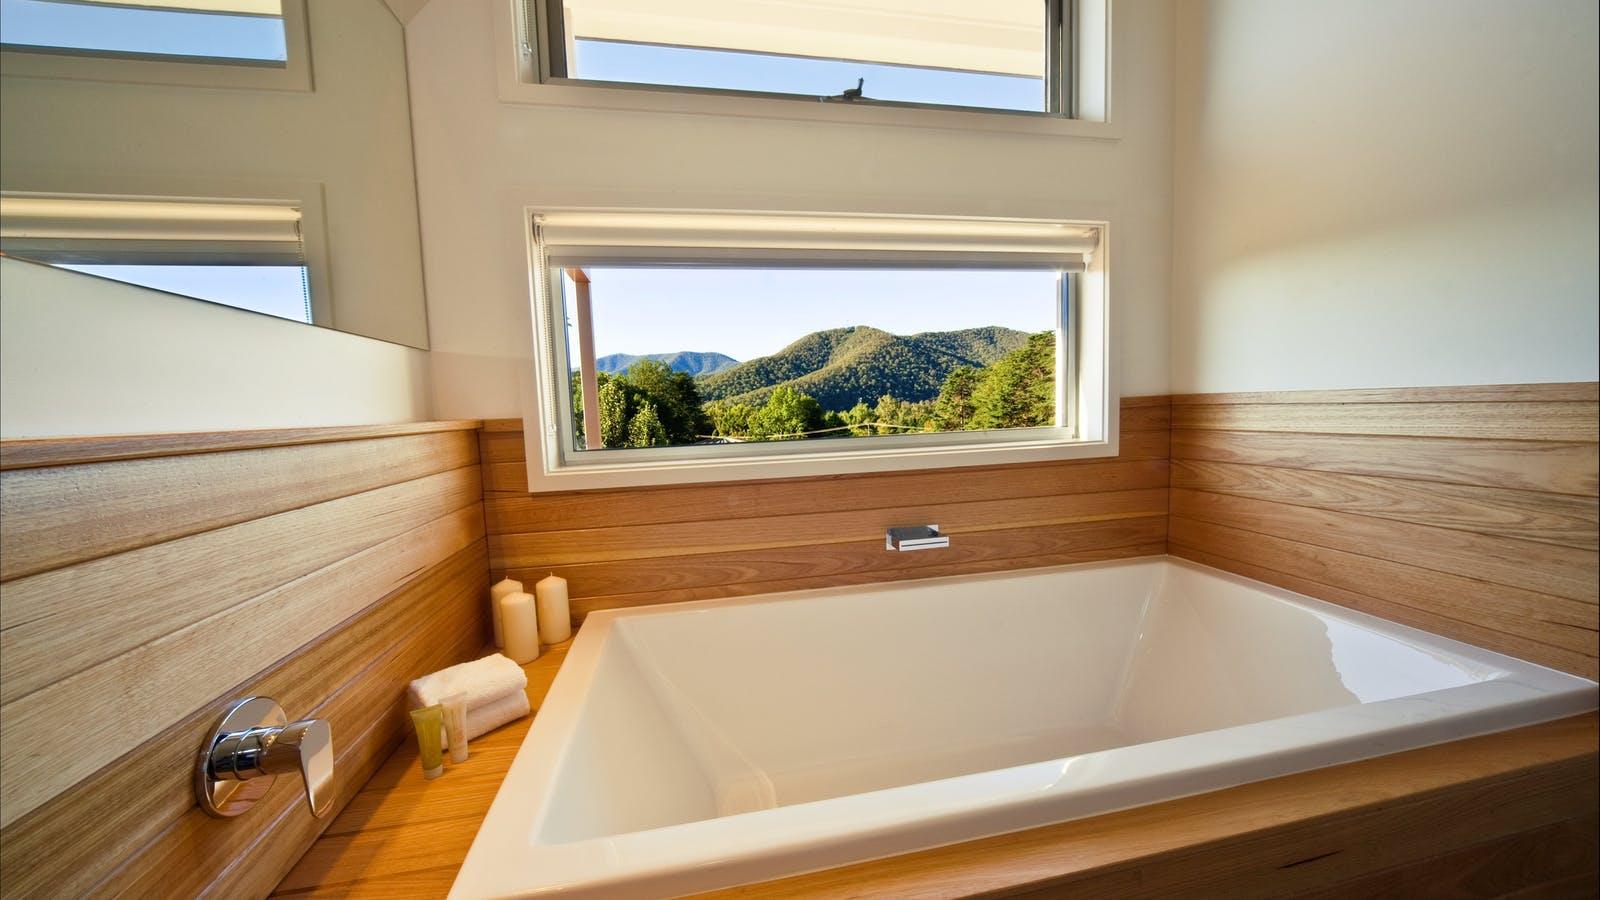 Bath with mountain views